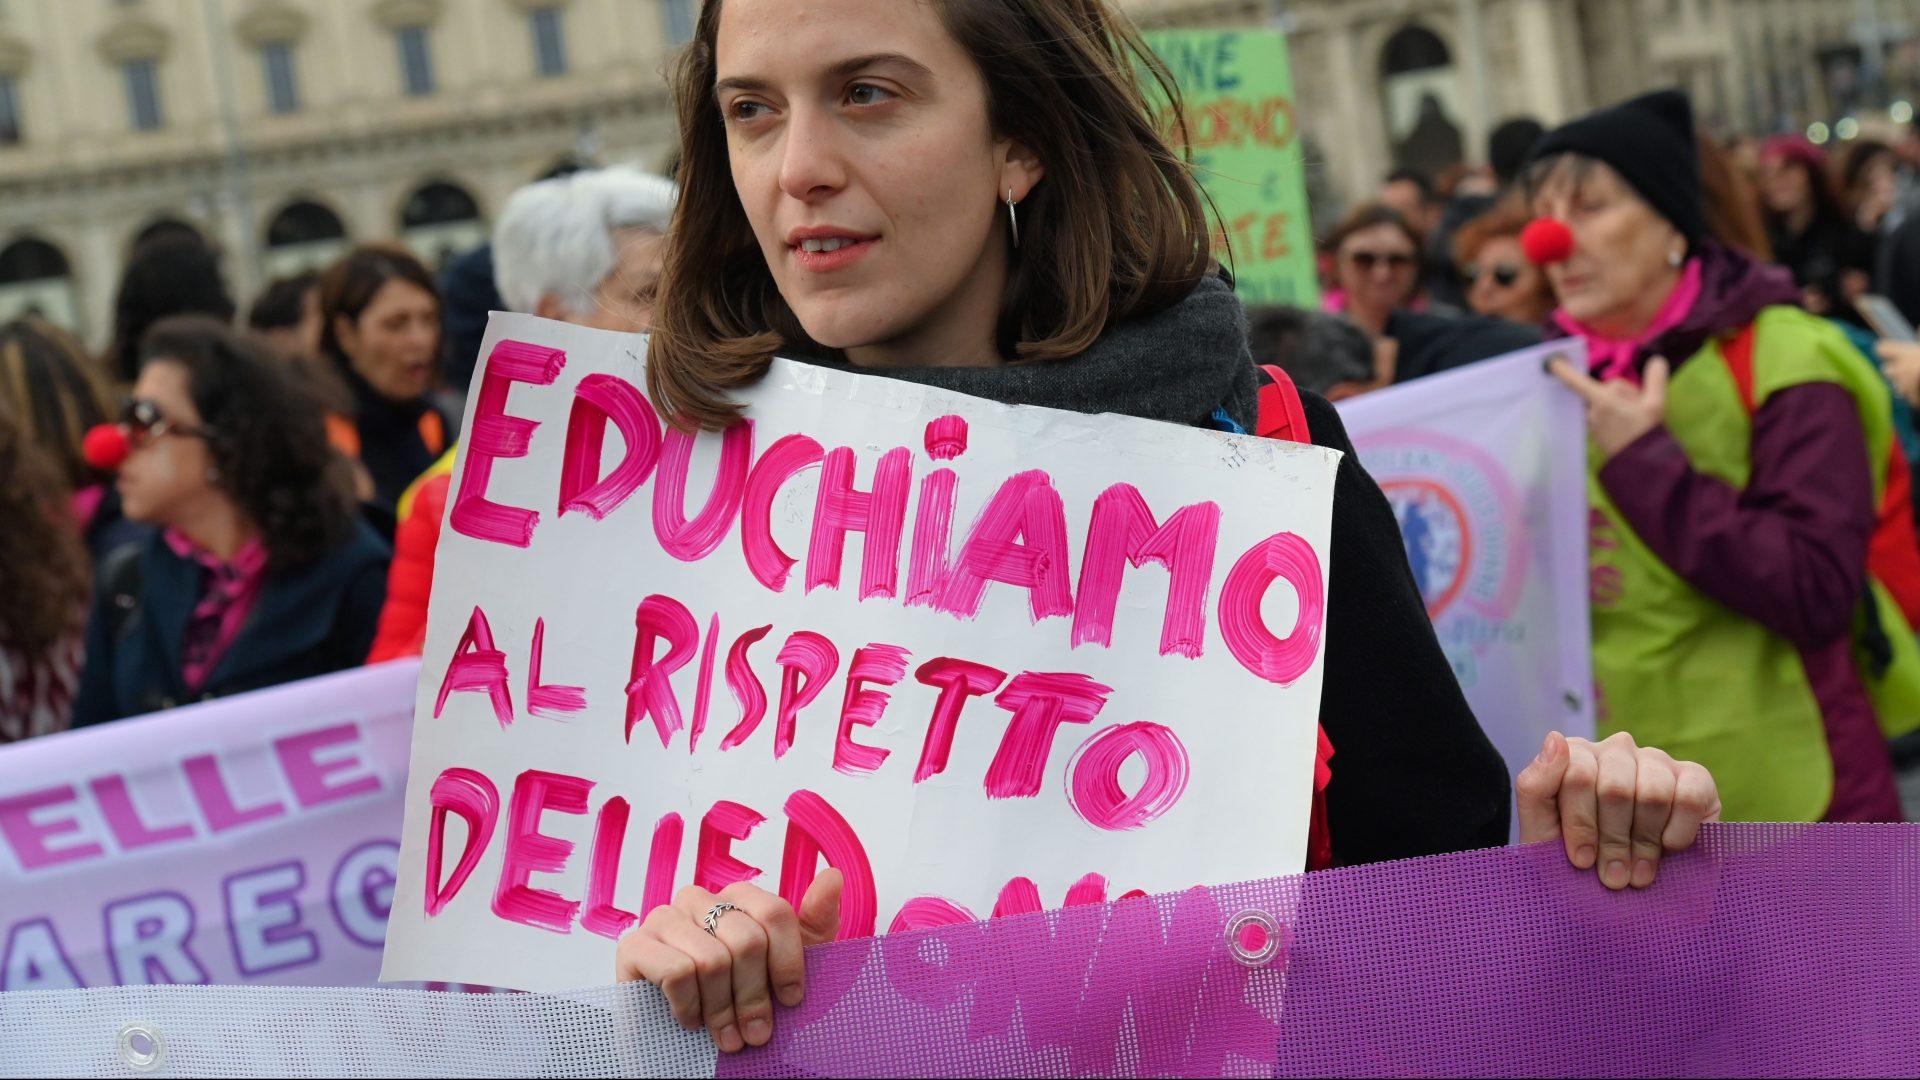 L'Italia garantisce assistenza legale gratuita a tutte le vittime di violenza